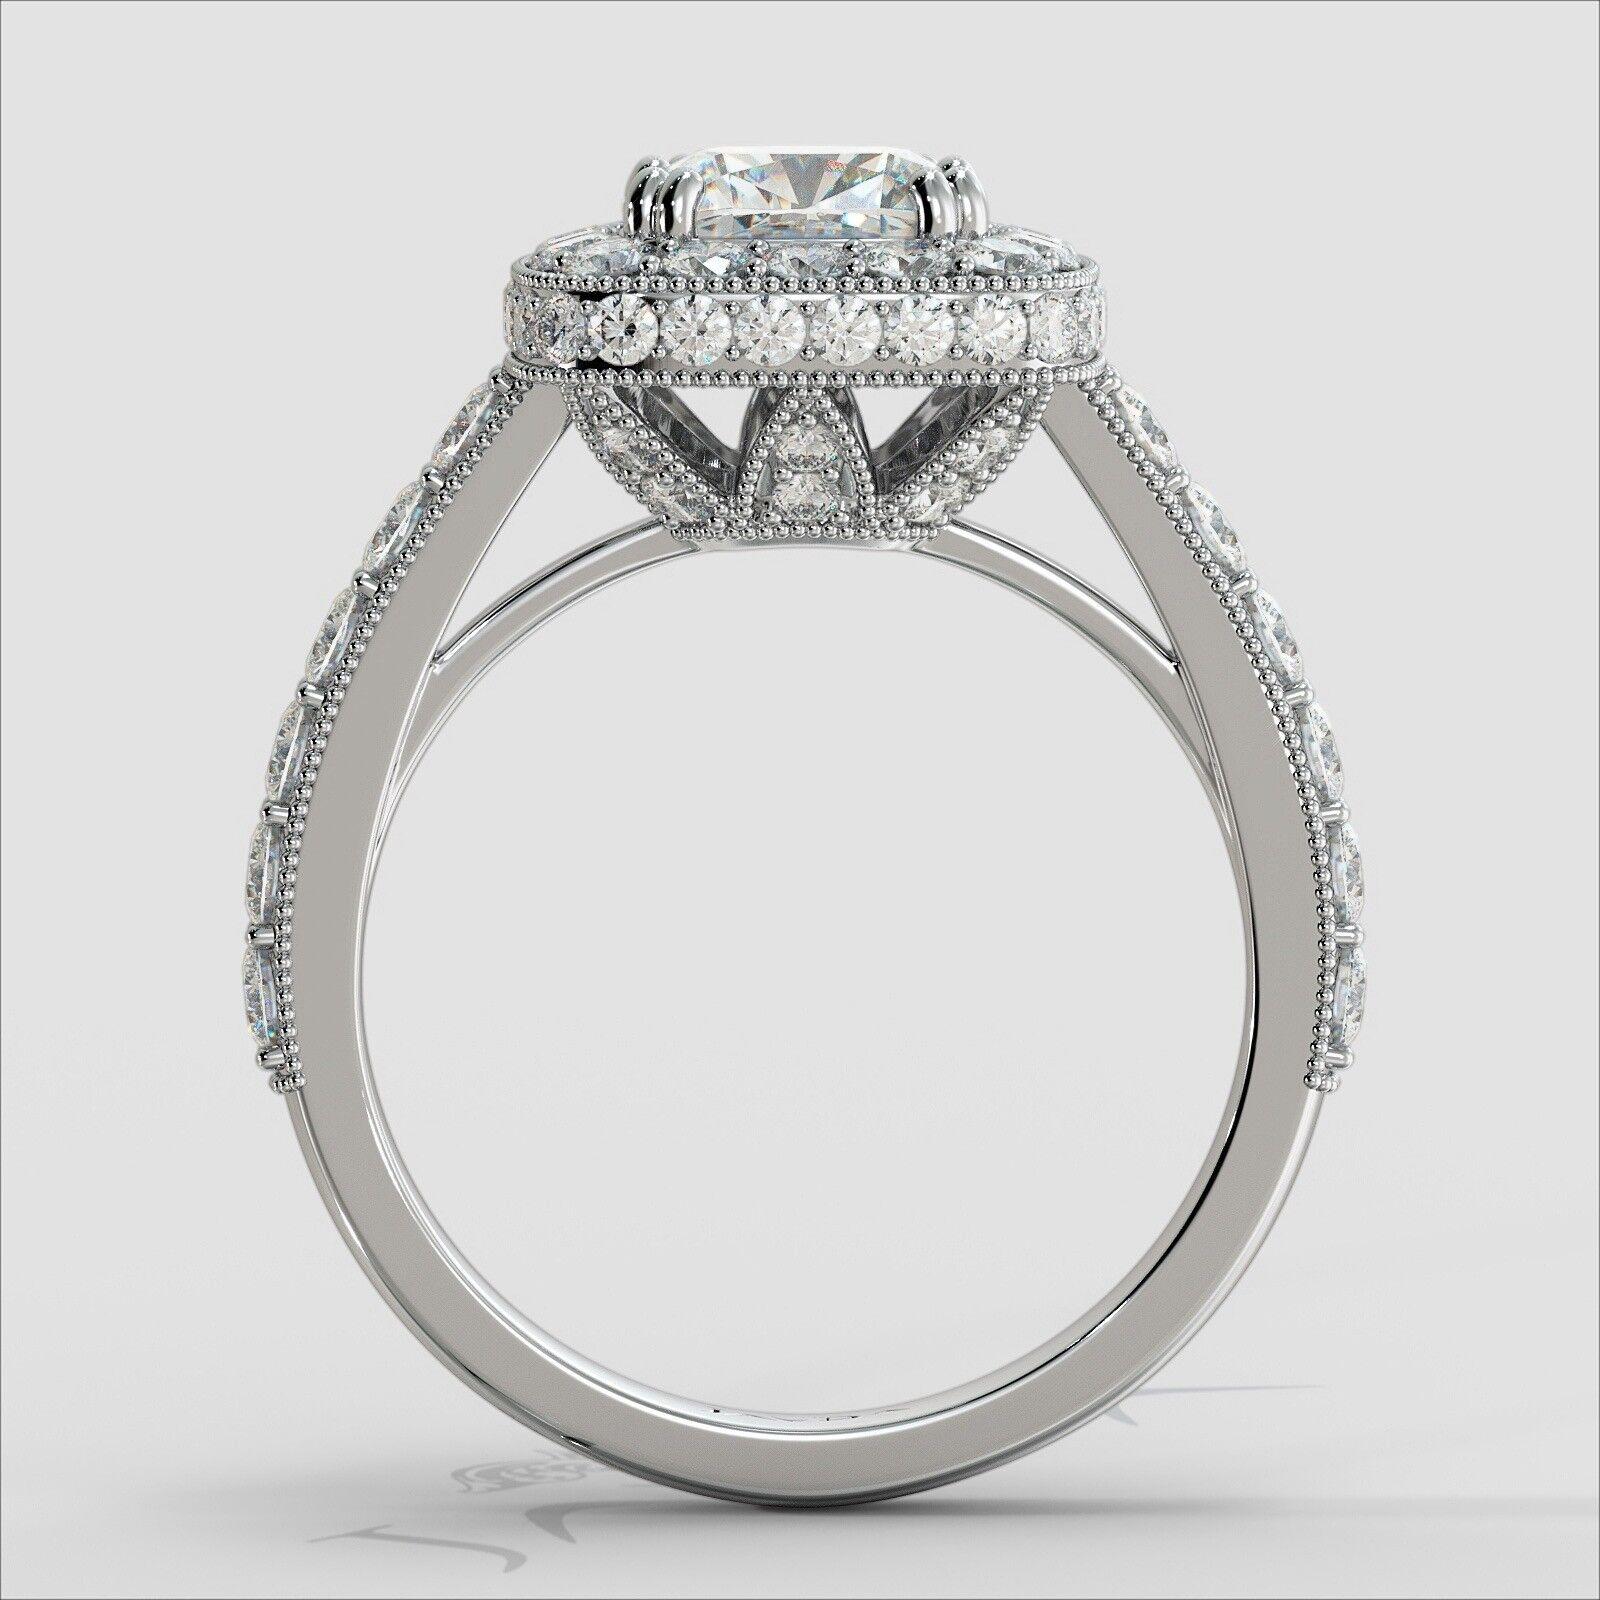 2.12ctw Milgrain Floral Basket Cushion Diamond Engagement Ring GIA I-SI2 W Gold 3